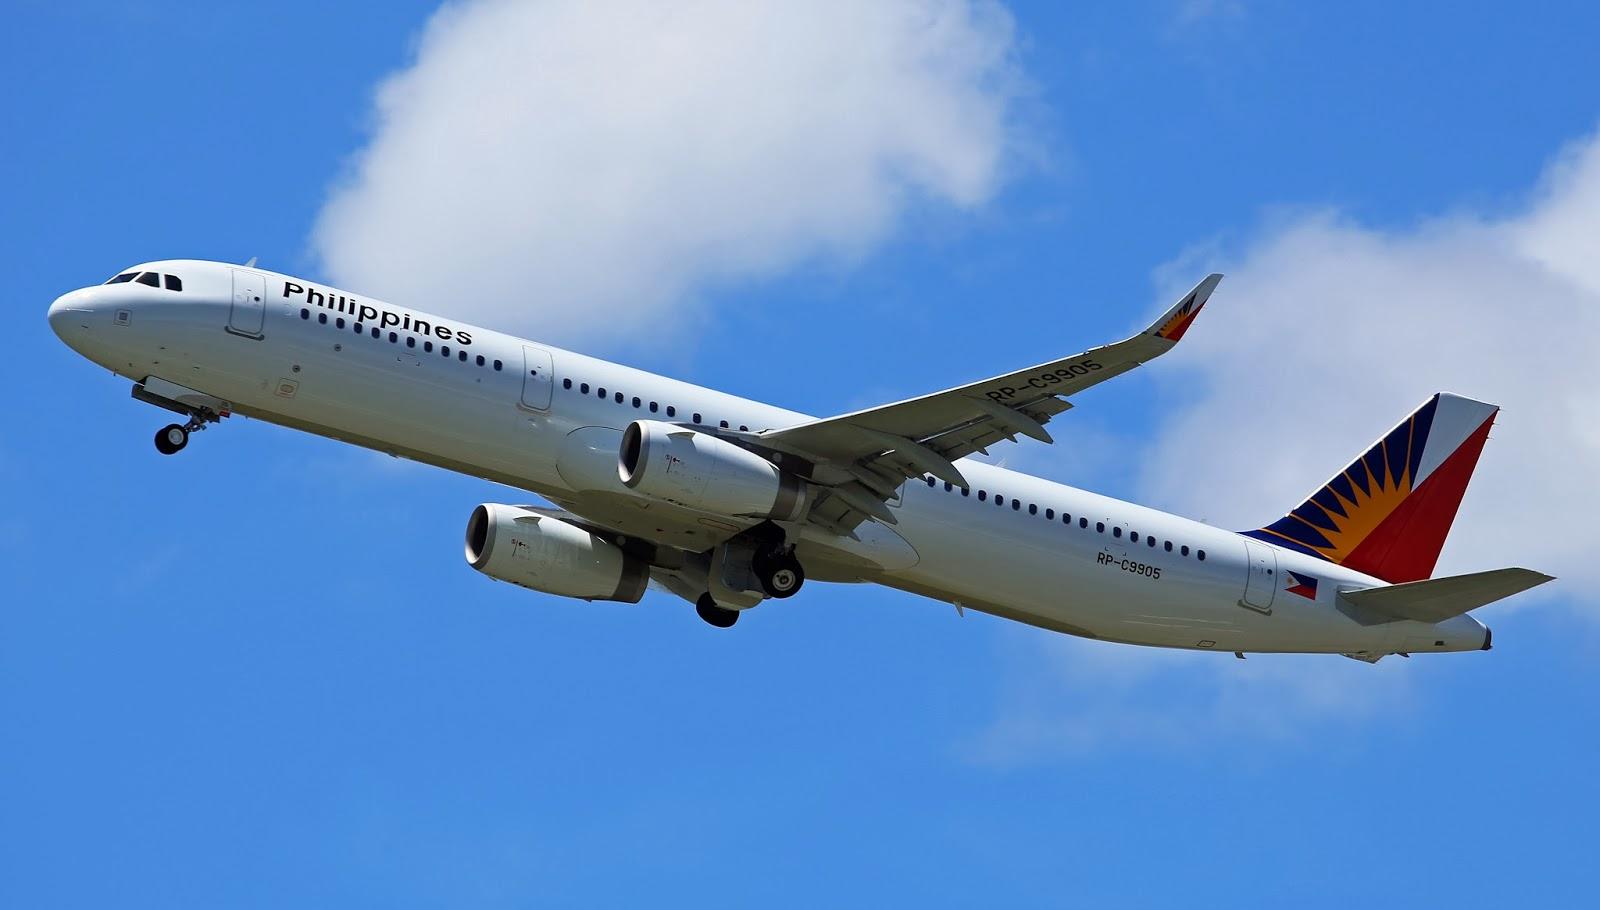 brisbane airport movements  pal a321 rp